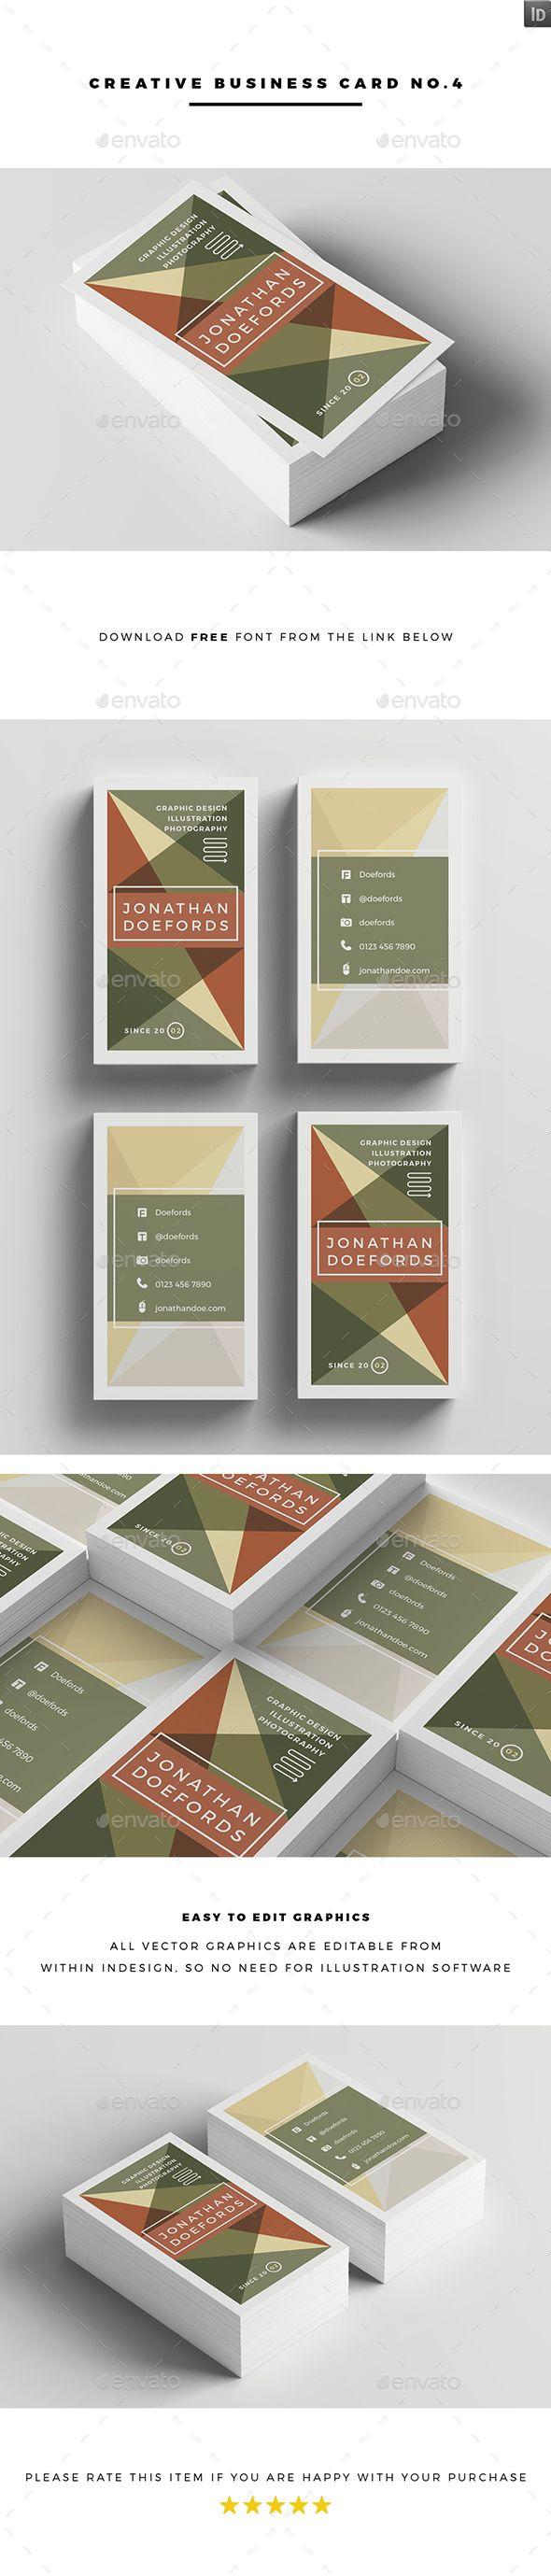 Creative Business Card No.4 - Creative Business Cards